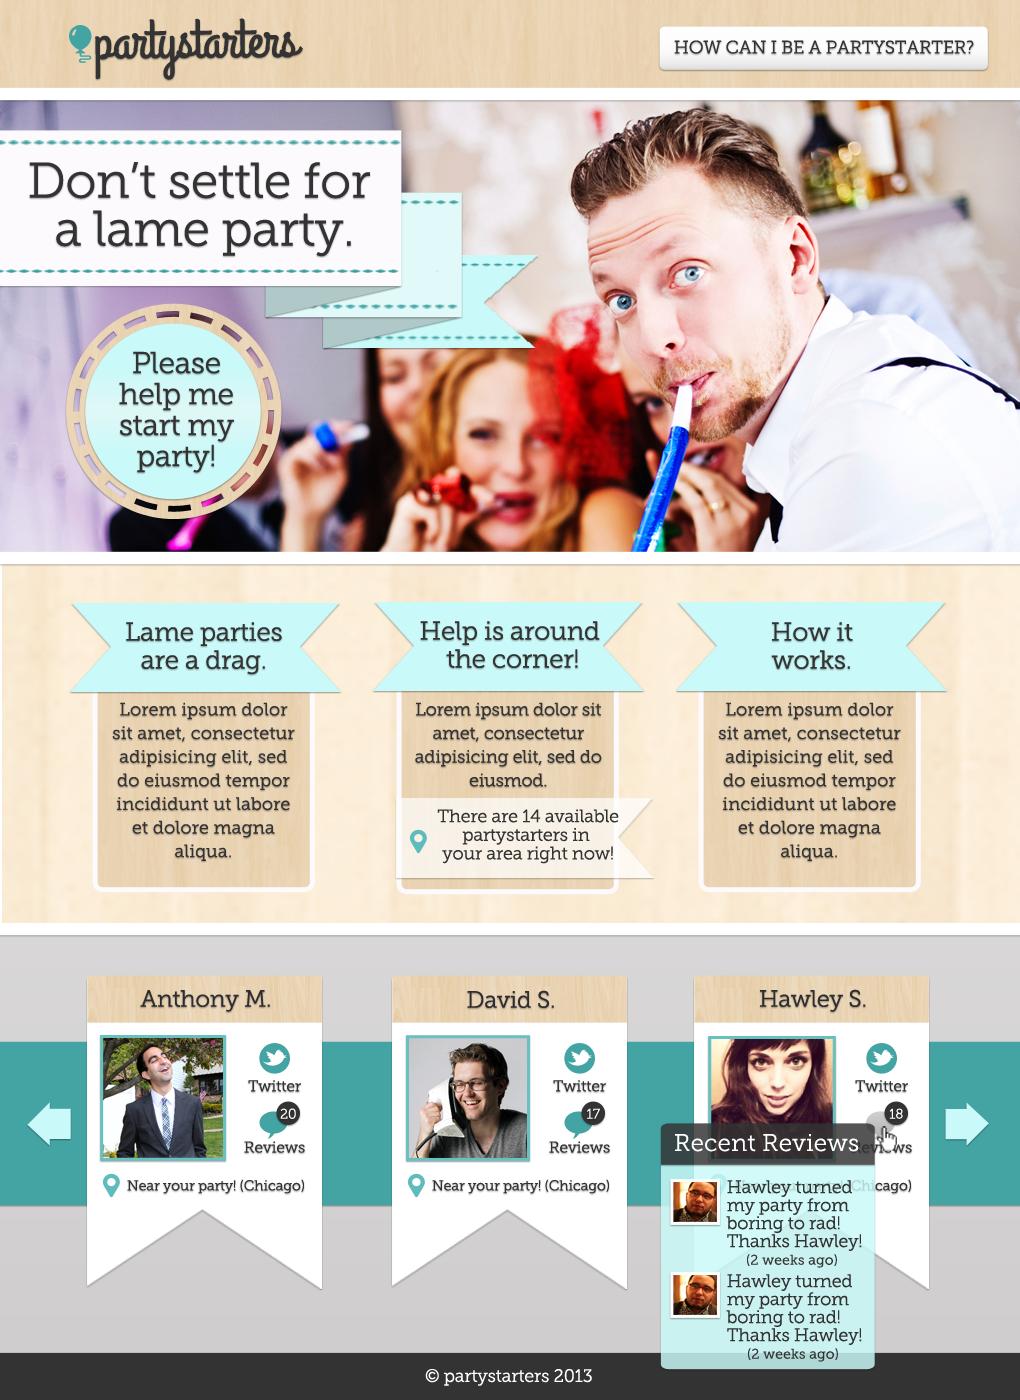 Partystarters website (Update!) - image 2 - student project